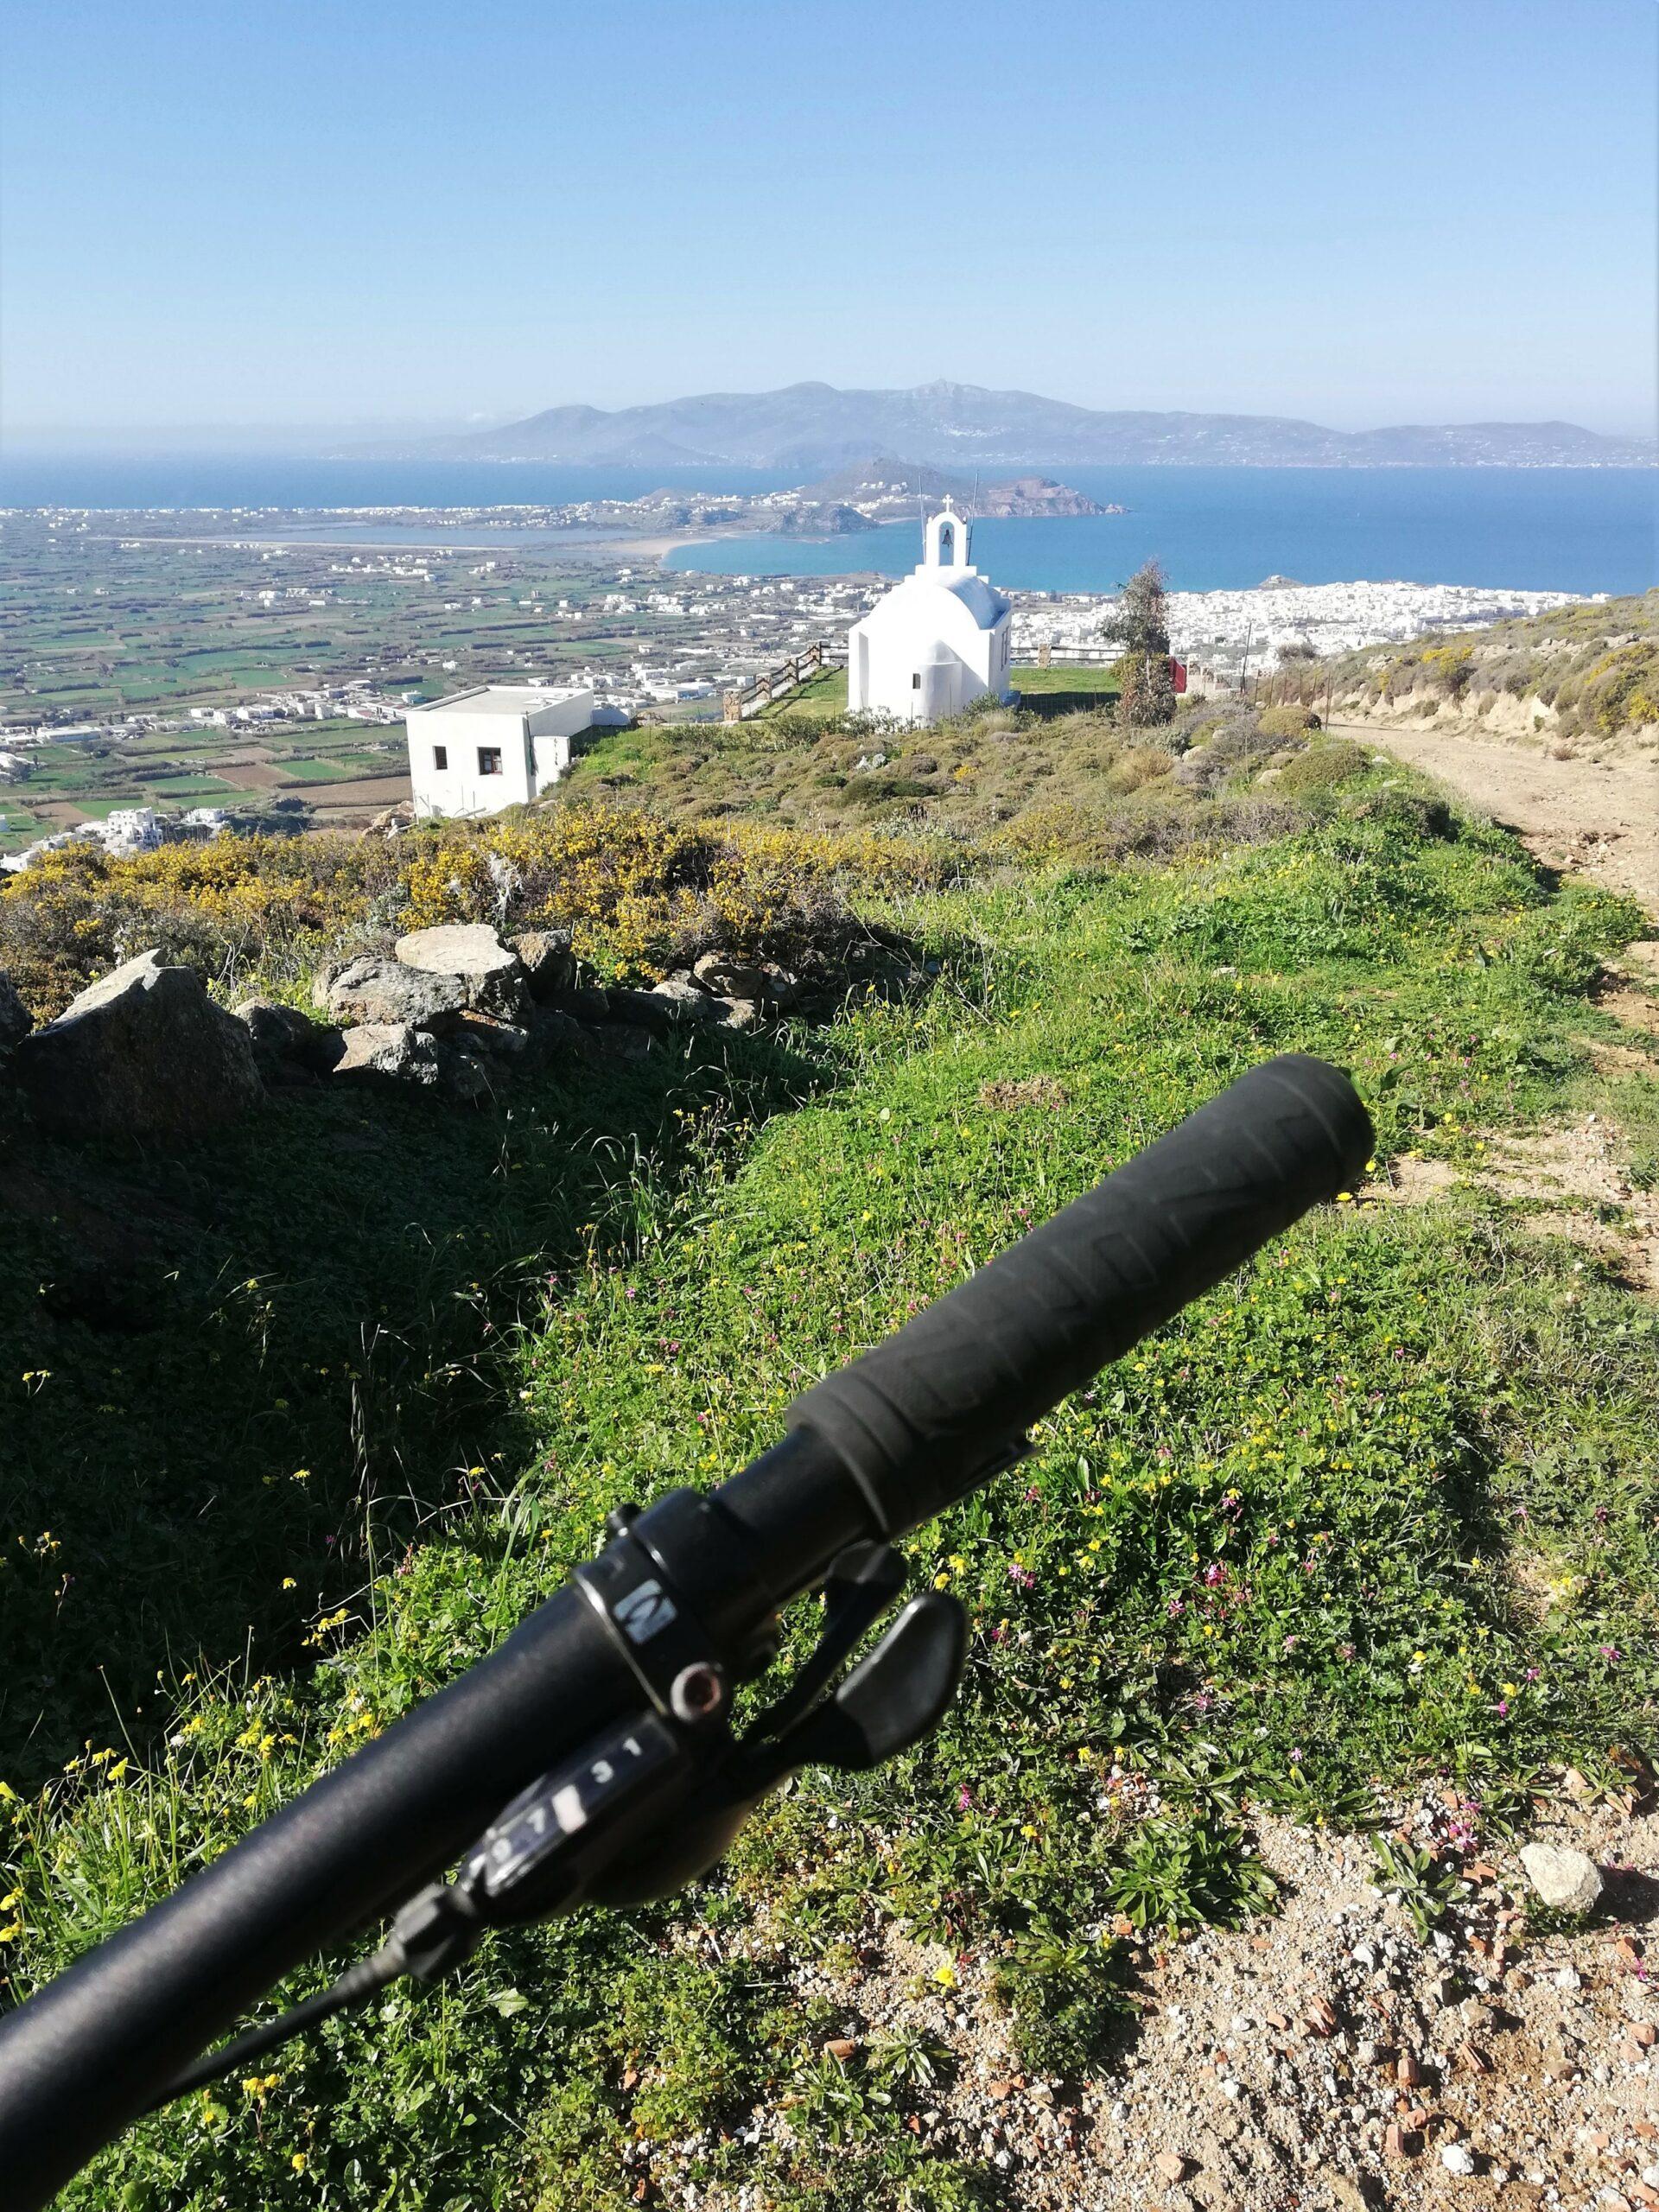 vtt mtb ghost bikes mountainbiking naxos greece flisvos sportclub trekking trails off road explore